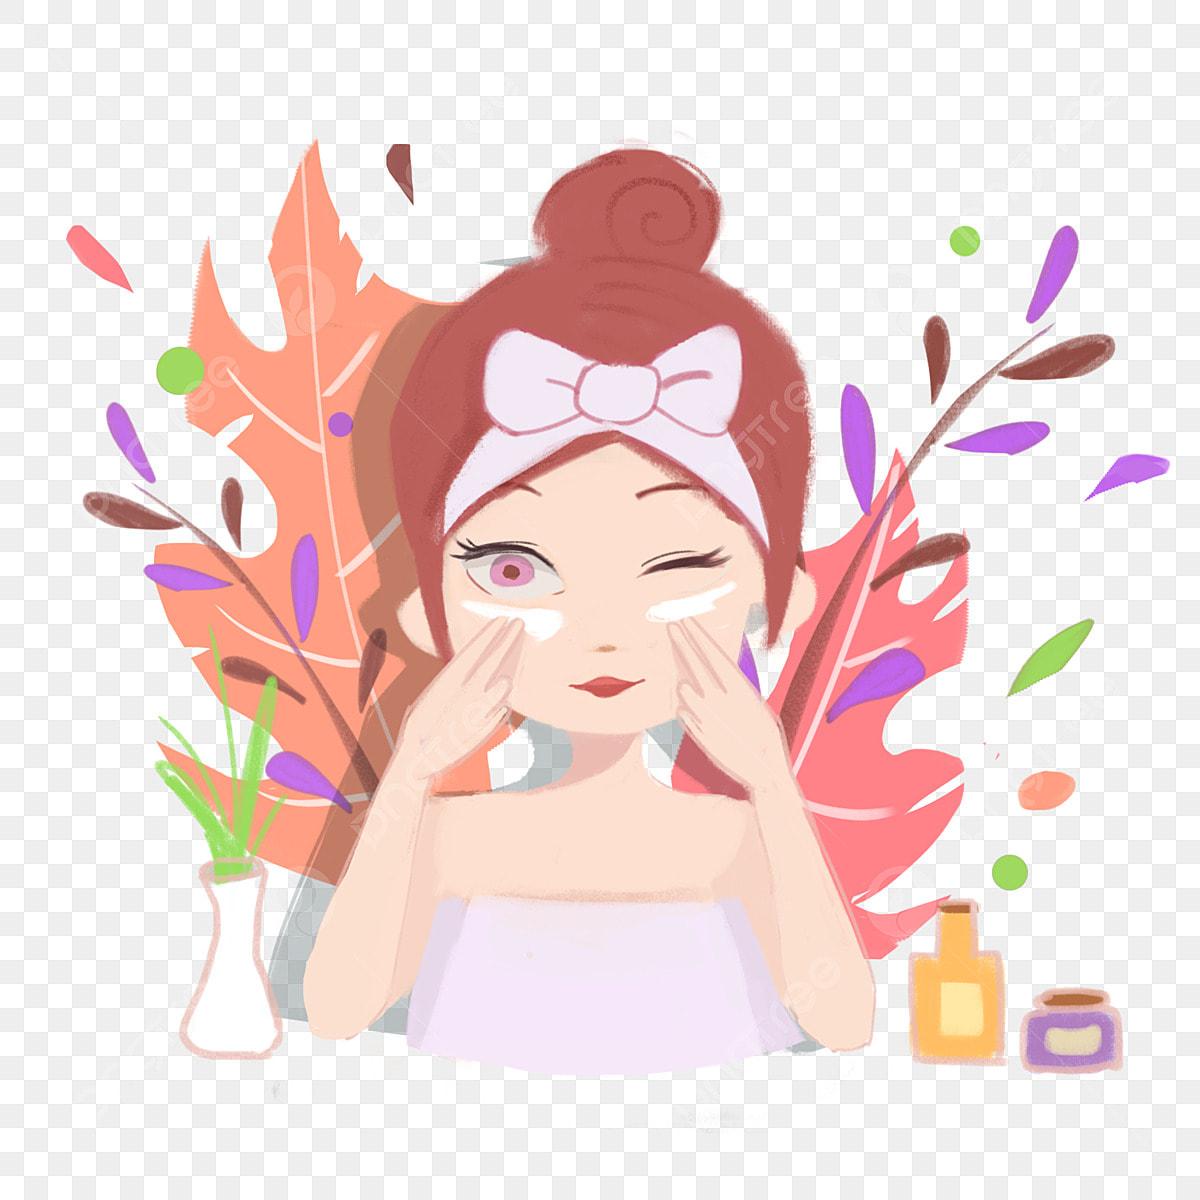 Makeup And Skin Care: Beauty Makeup Step Skin Care Facial, Nursing, Cosmetic